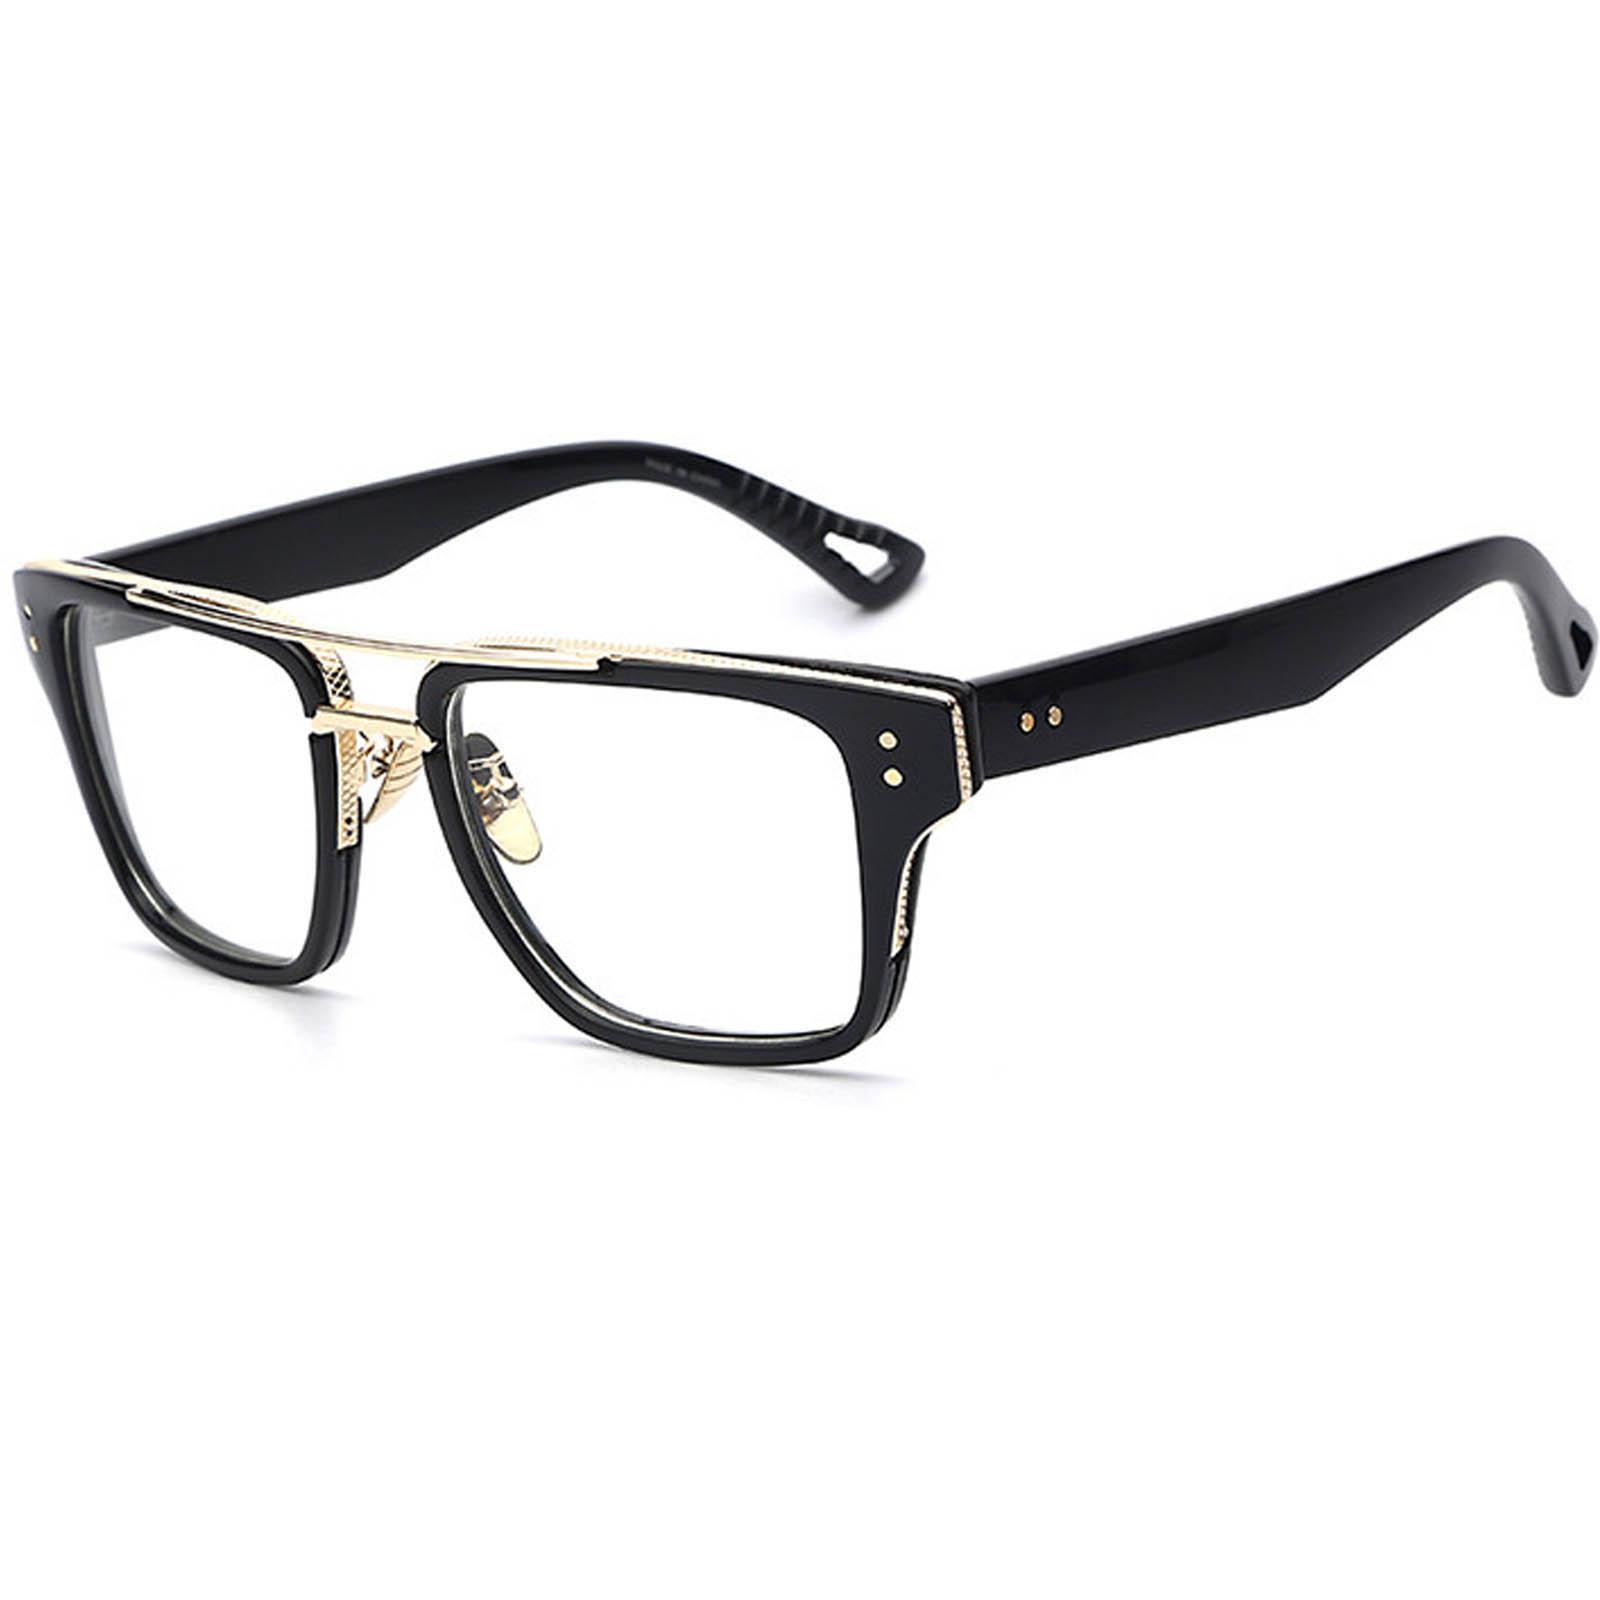 OWL ® 026 C5 Rectangle Eyewear Sunglasses Women\'s Men\'s Plastic ...